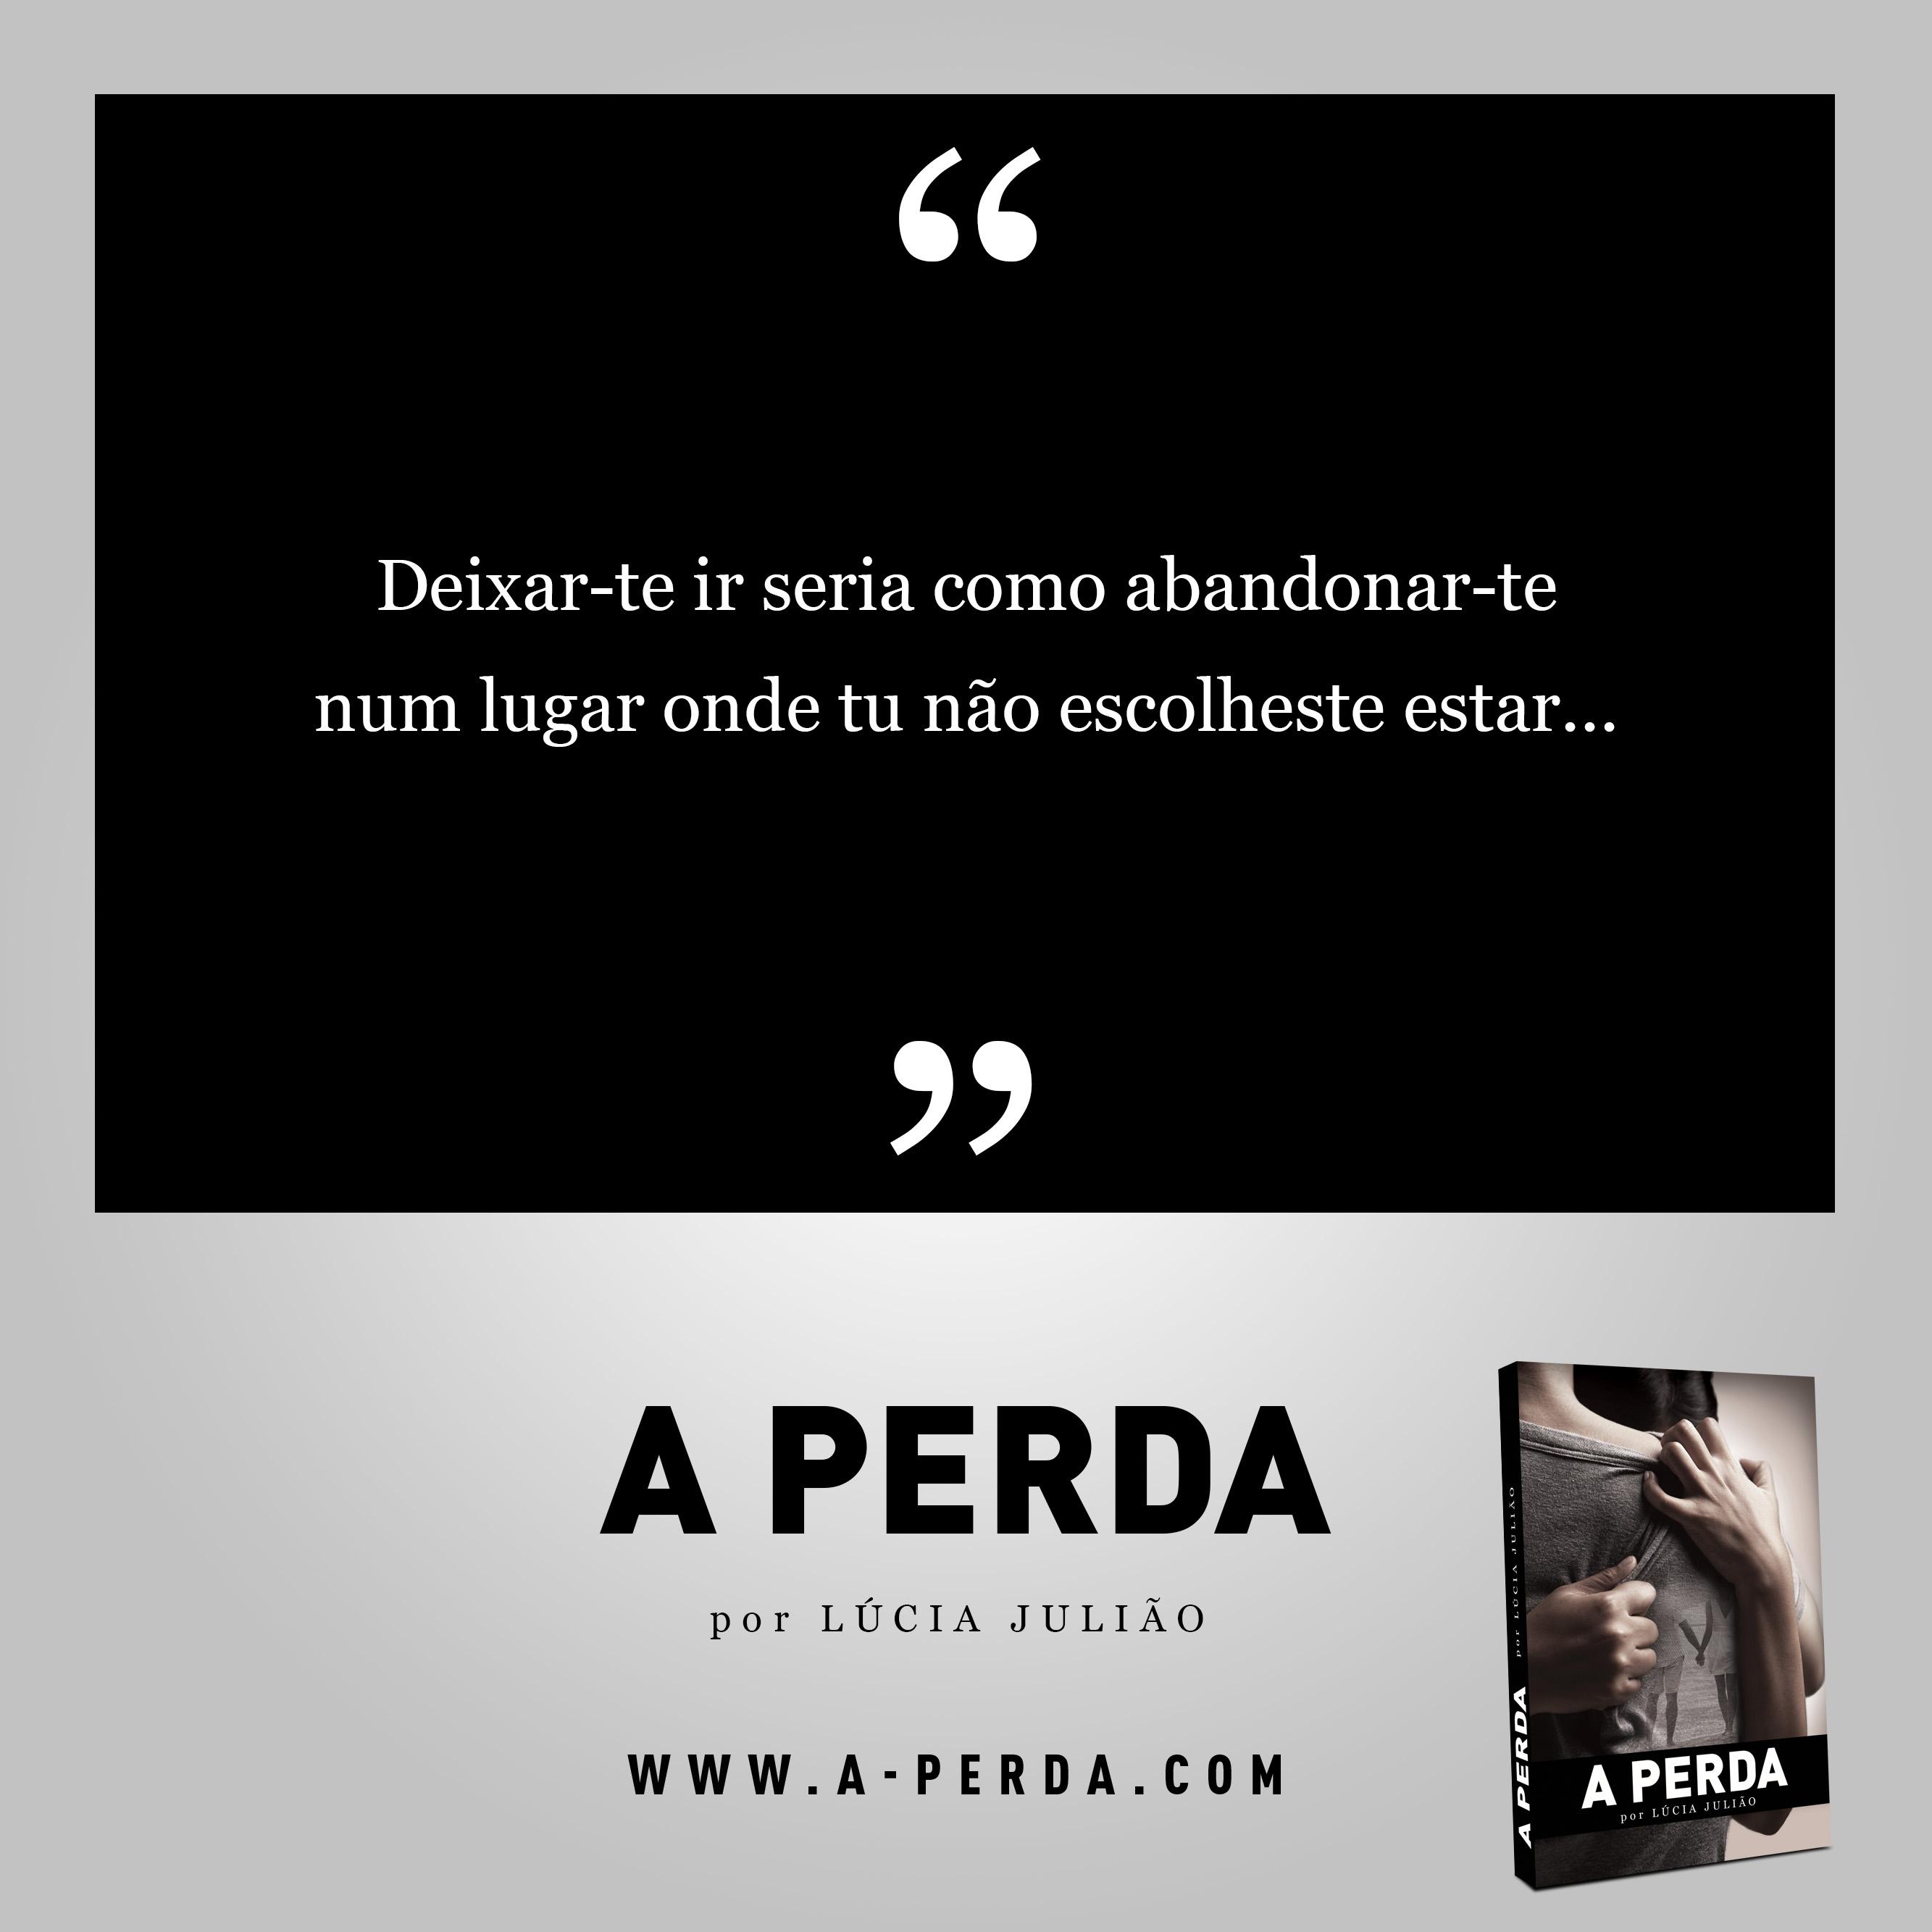 010-capitulo-46-livro-a-Perda-de-Lucia-Juliao-Instagram